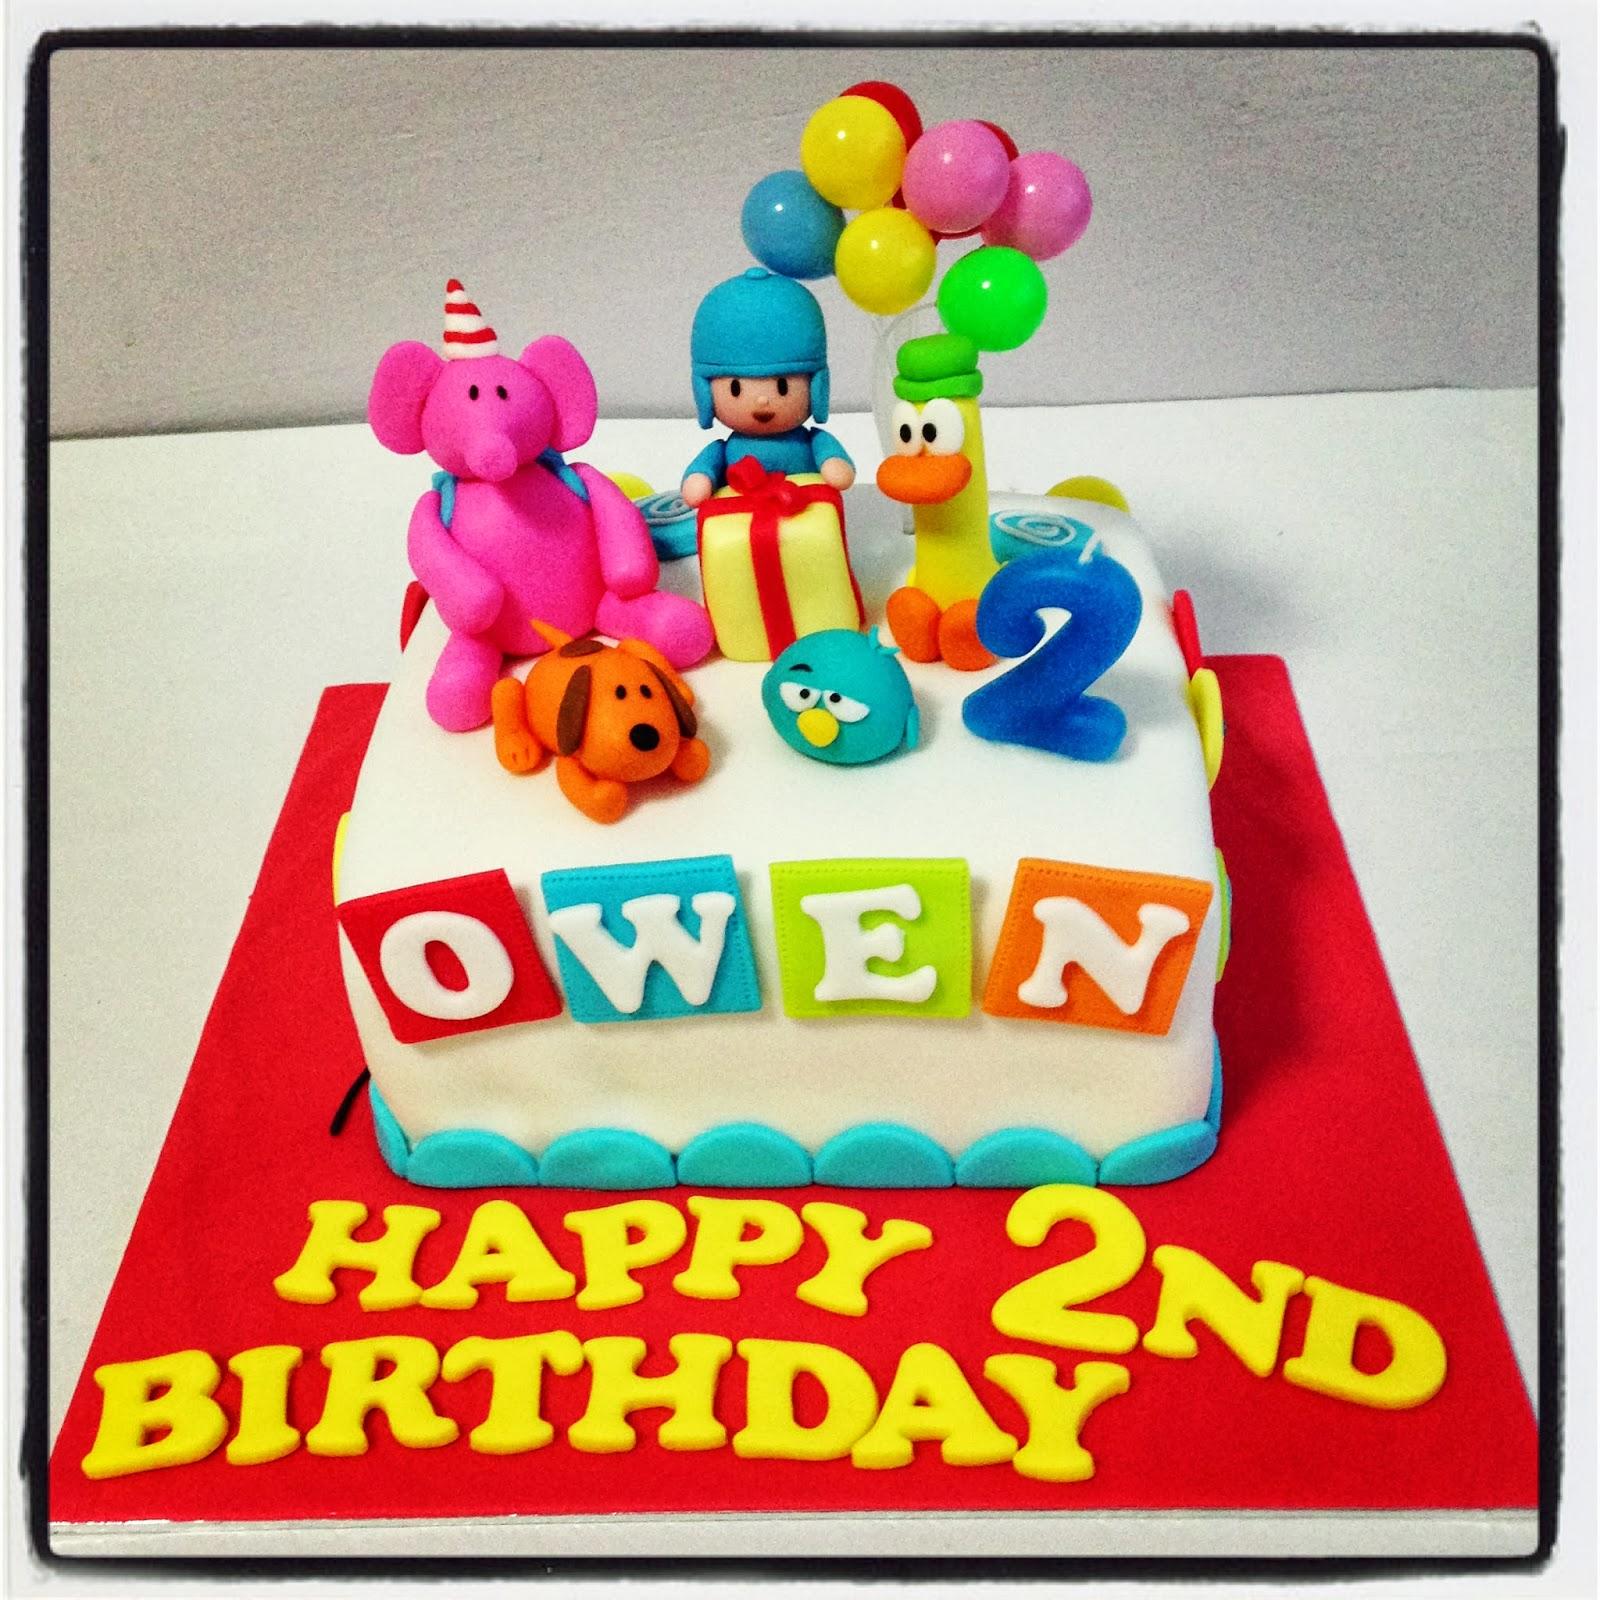 Oven Creations: Happy 2nd Birthday Owen